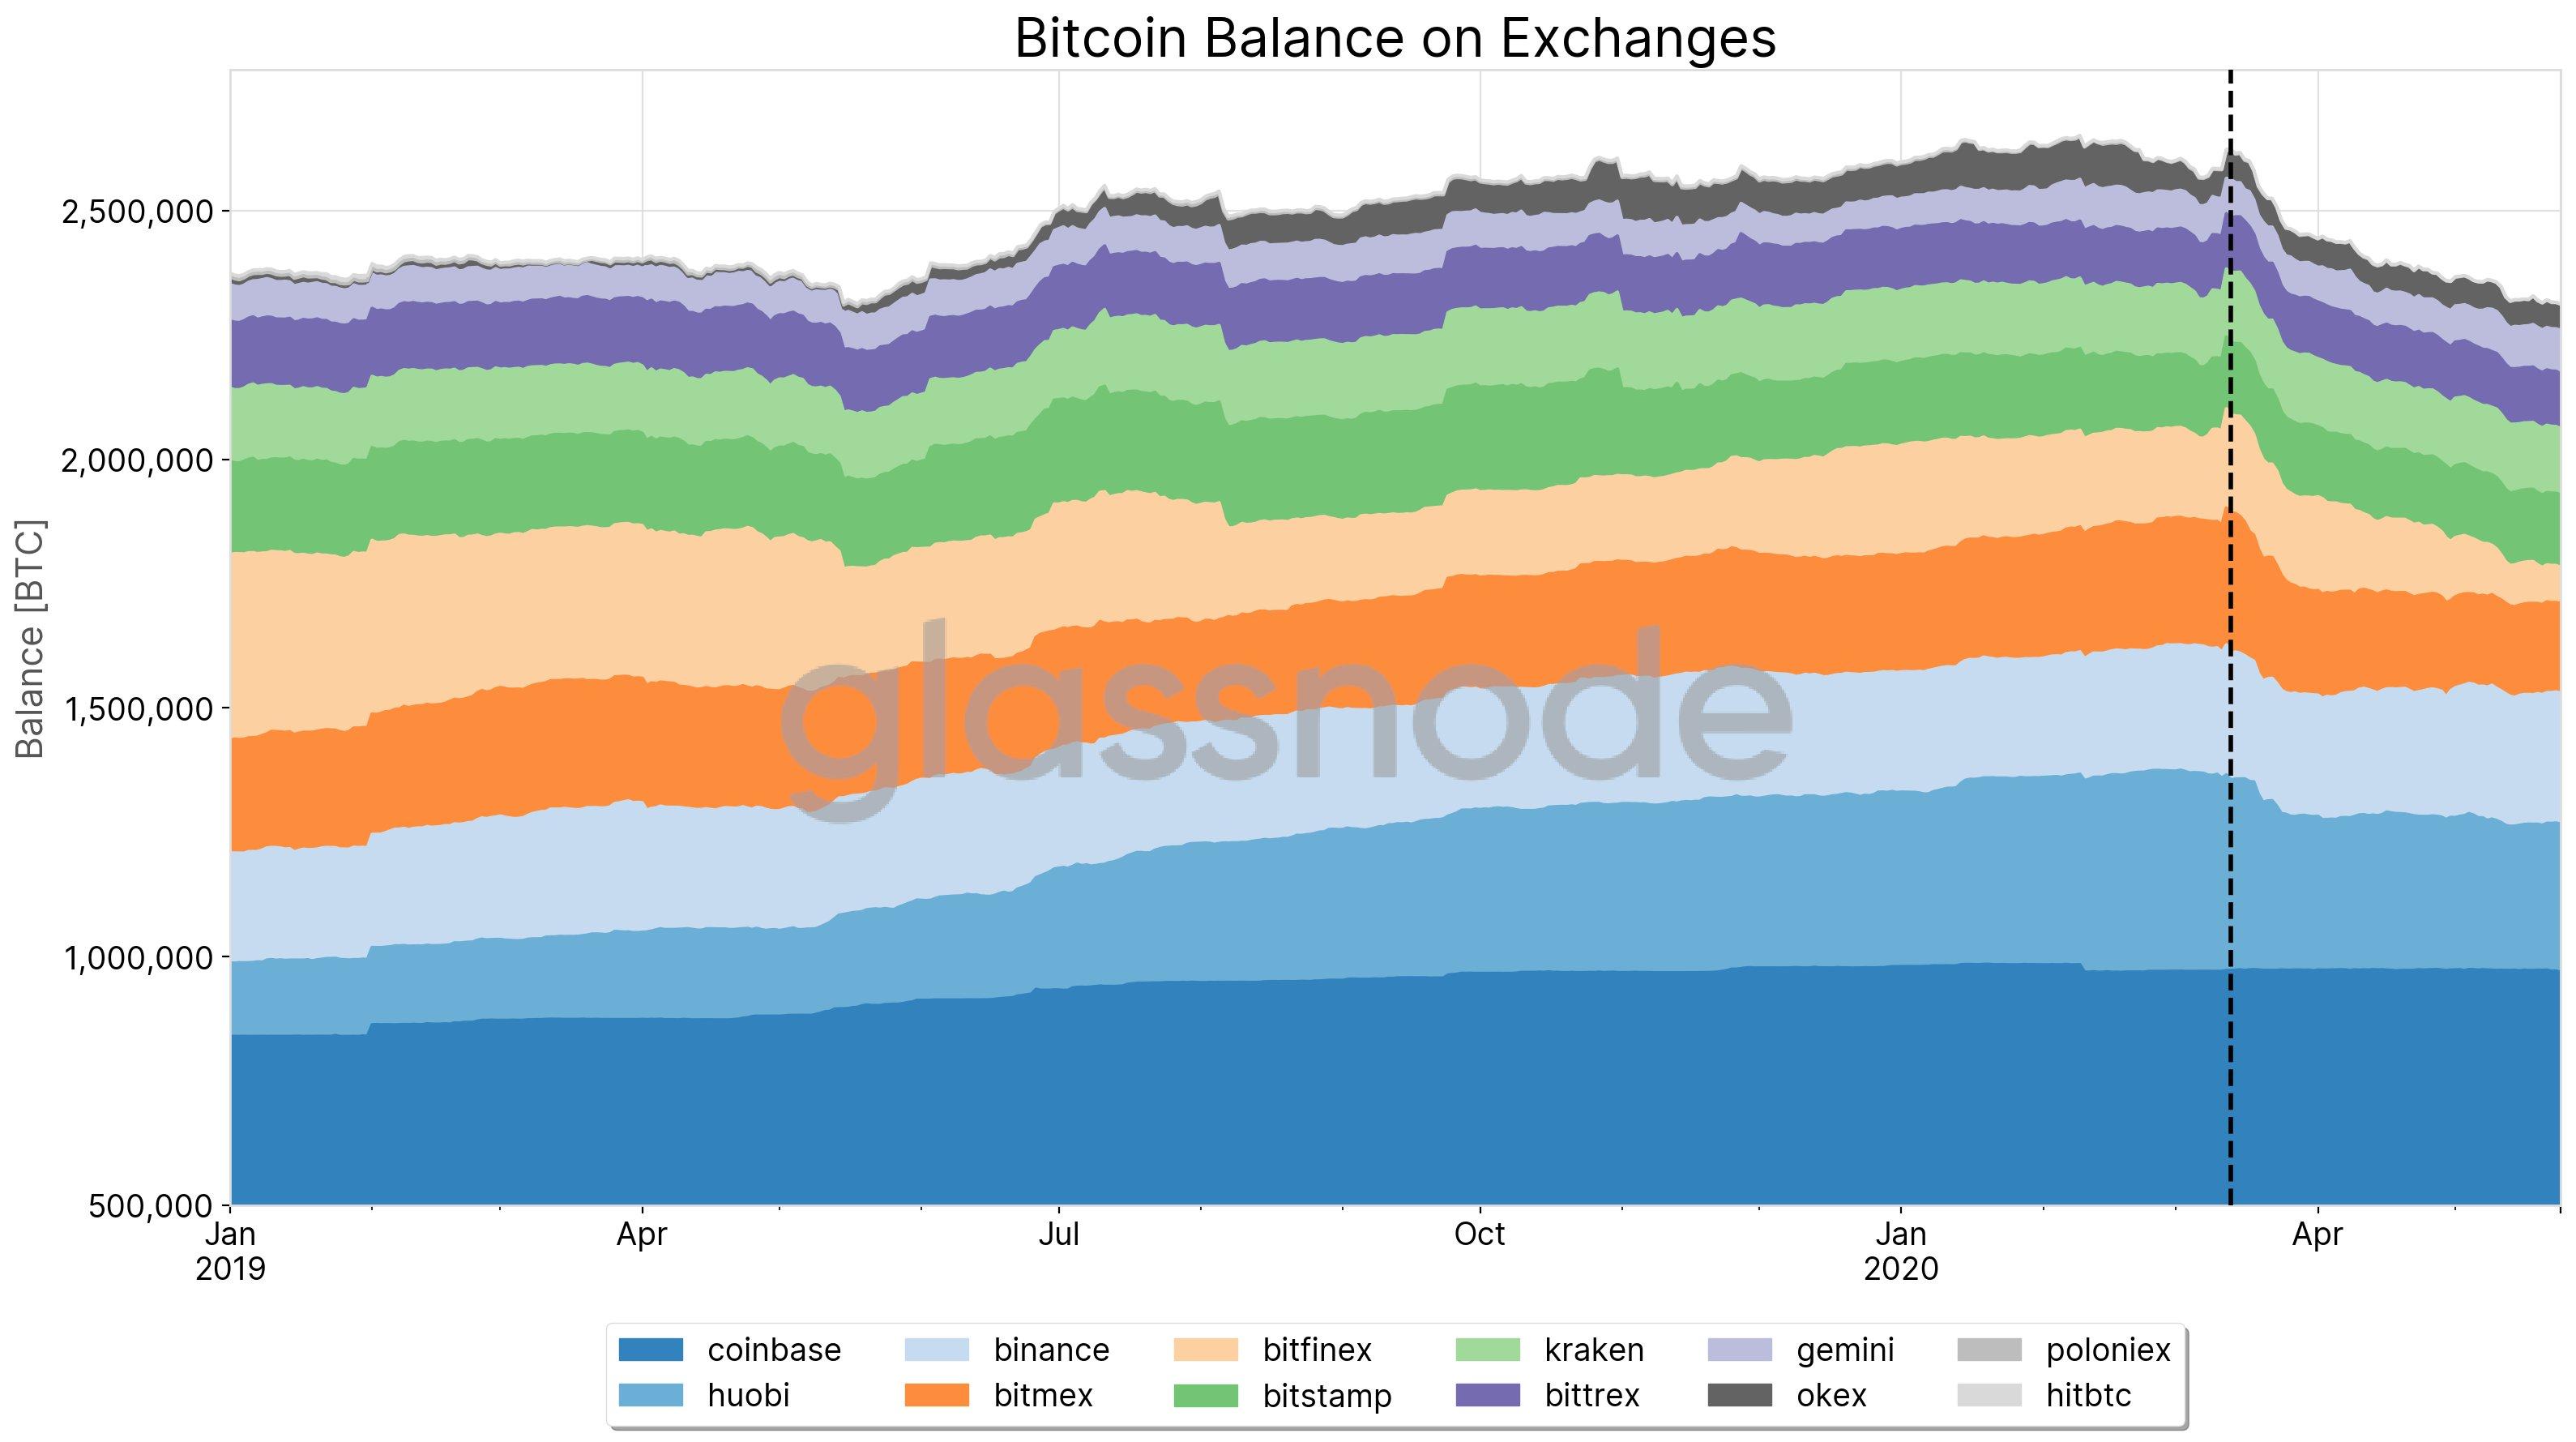 60% bitcoin за год ни разу не перемещали